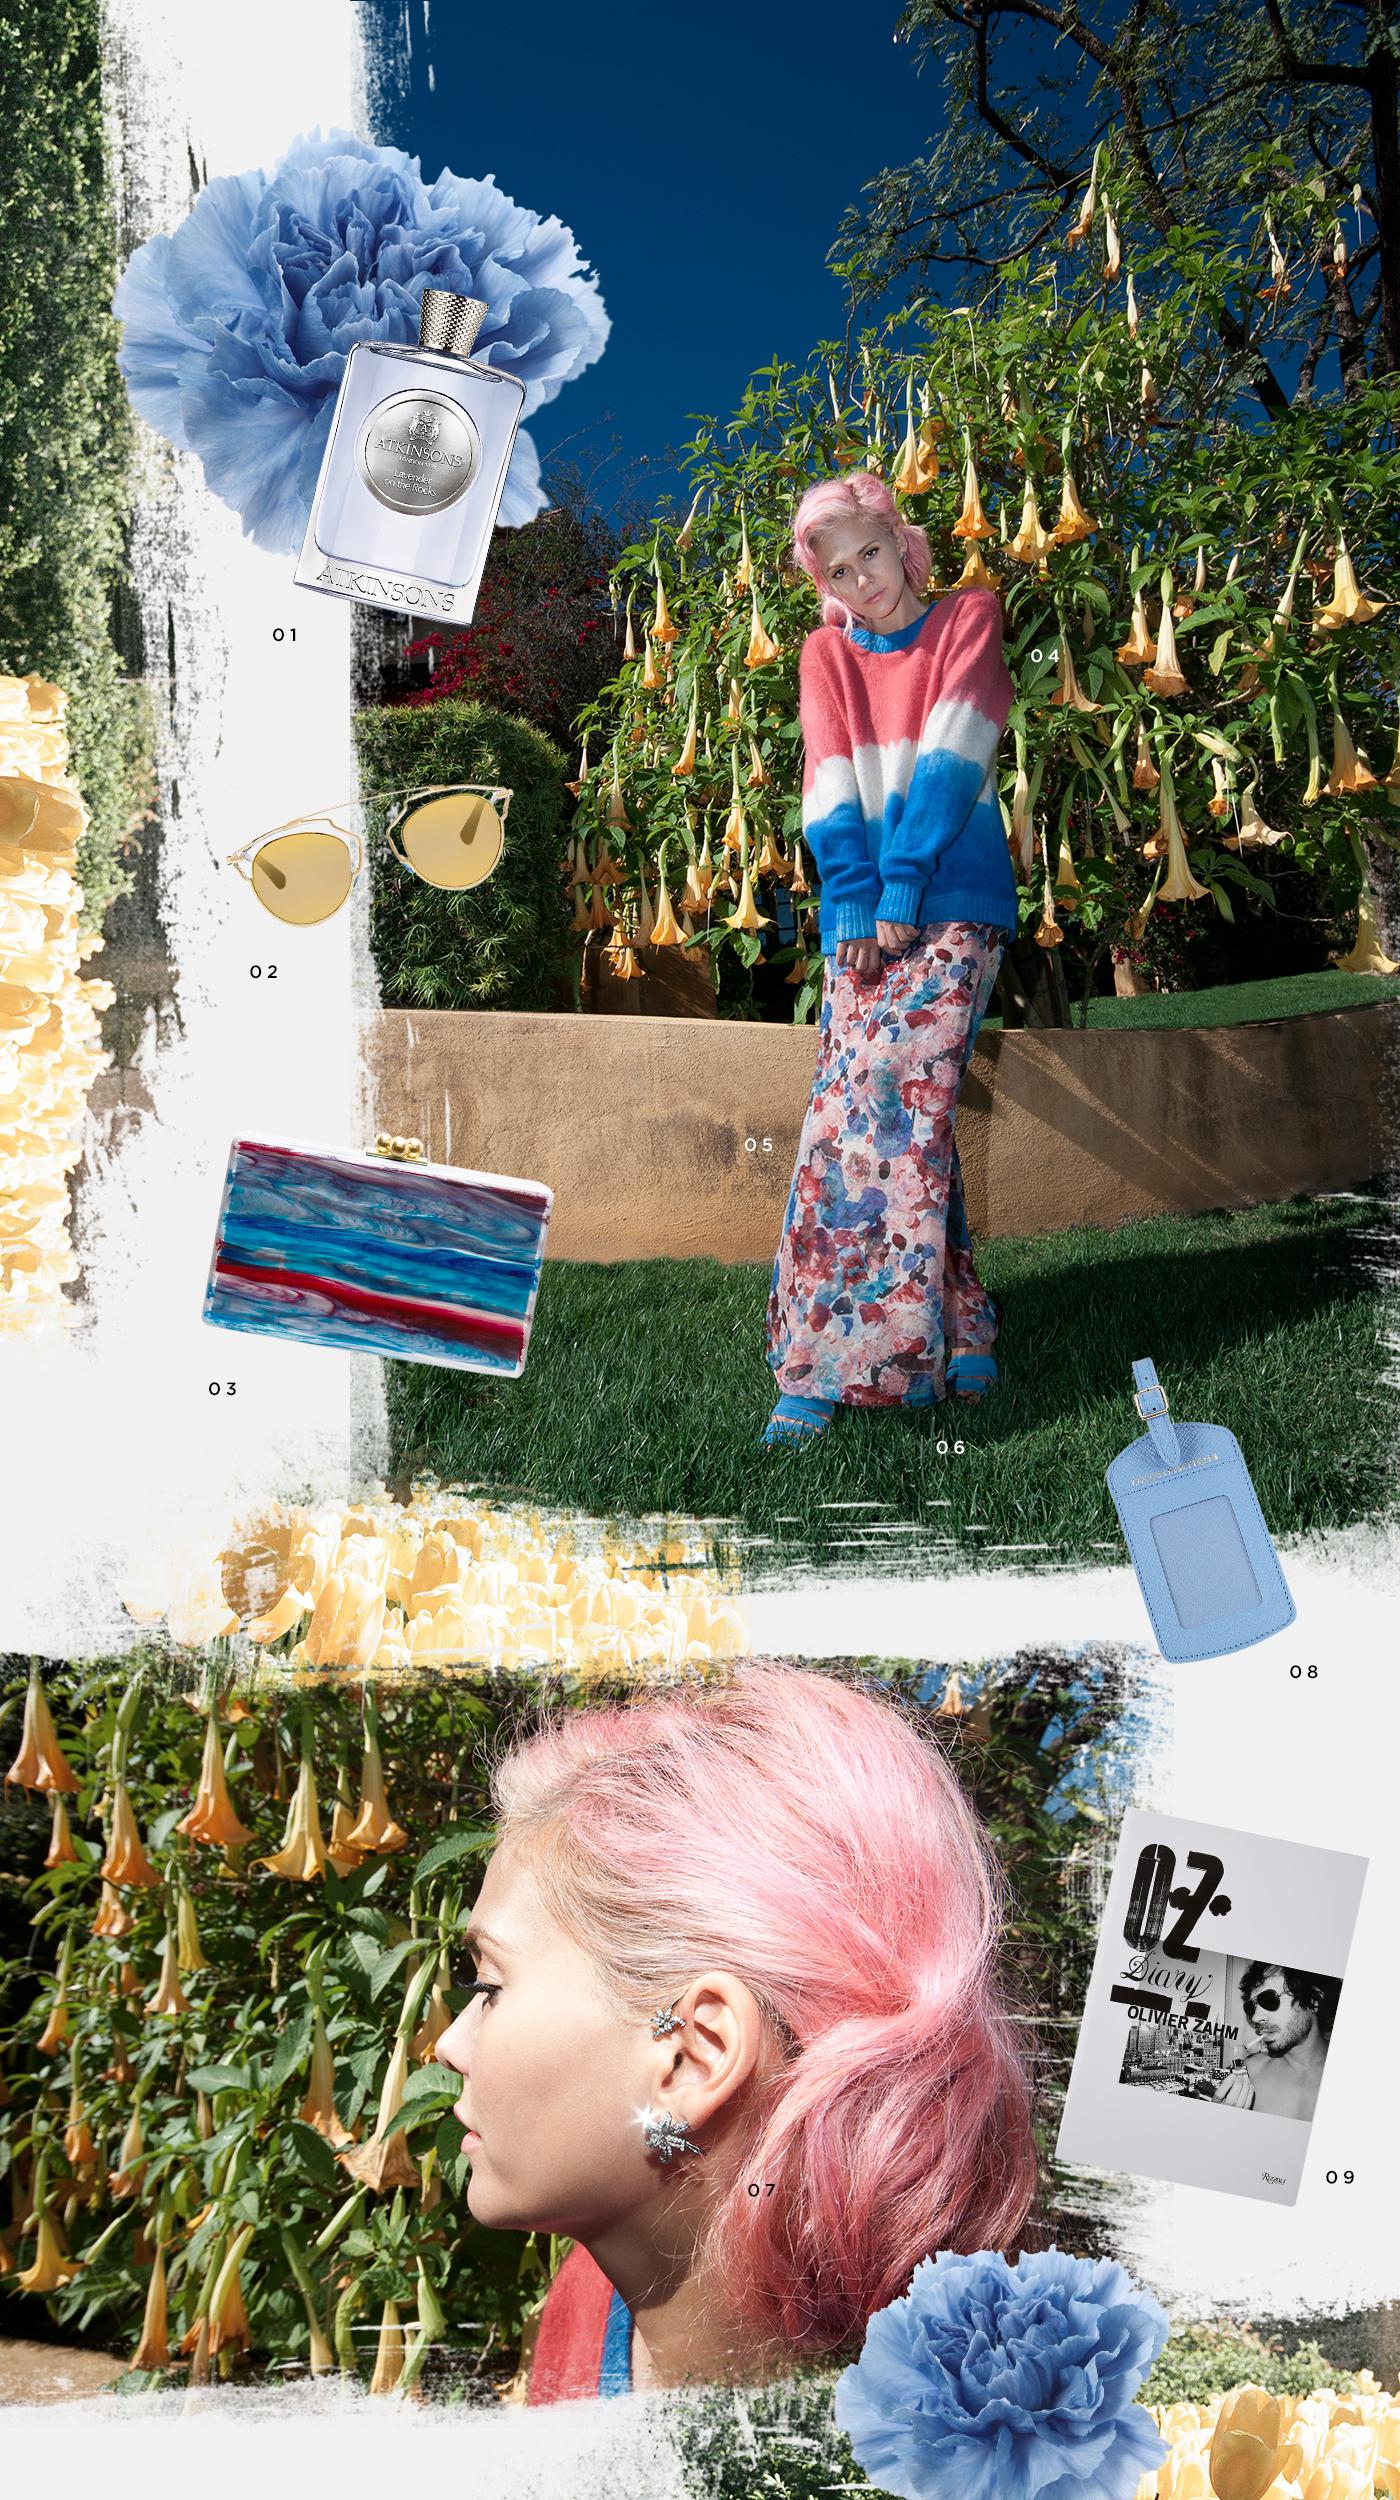 Cynthia-Mittweg-Maison-Mittweg-Looks-Dior-Atkinsons-Edie-Parker-Colette-Smythson